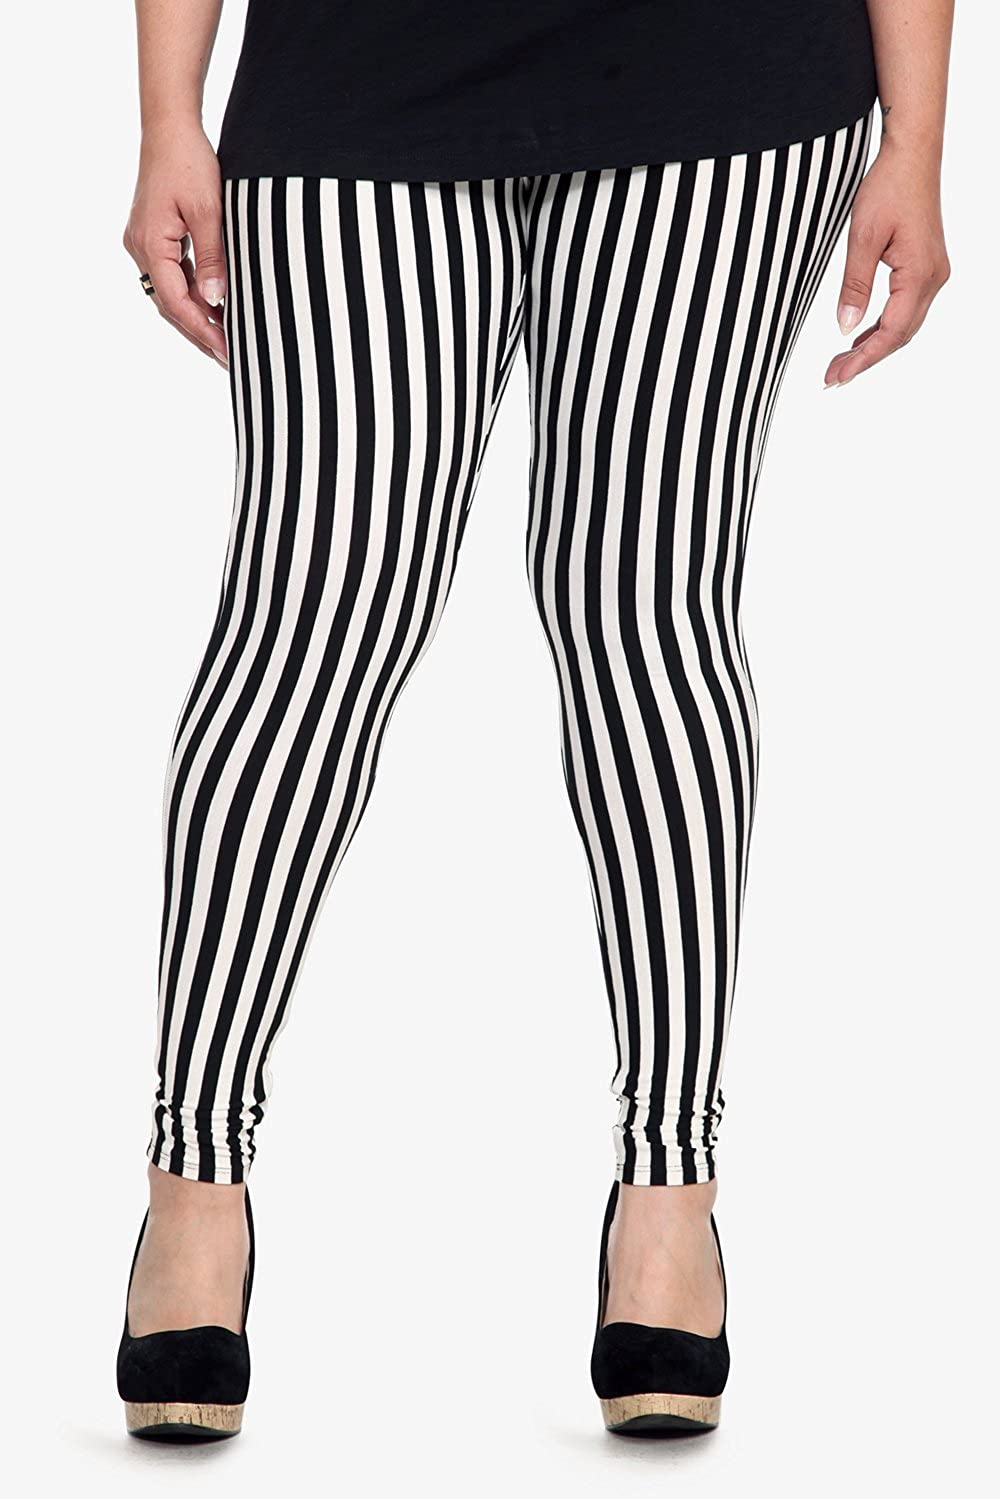 Plus Size Black and White Leggings